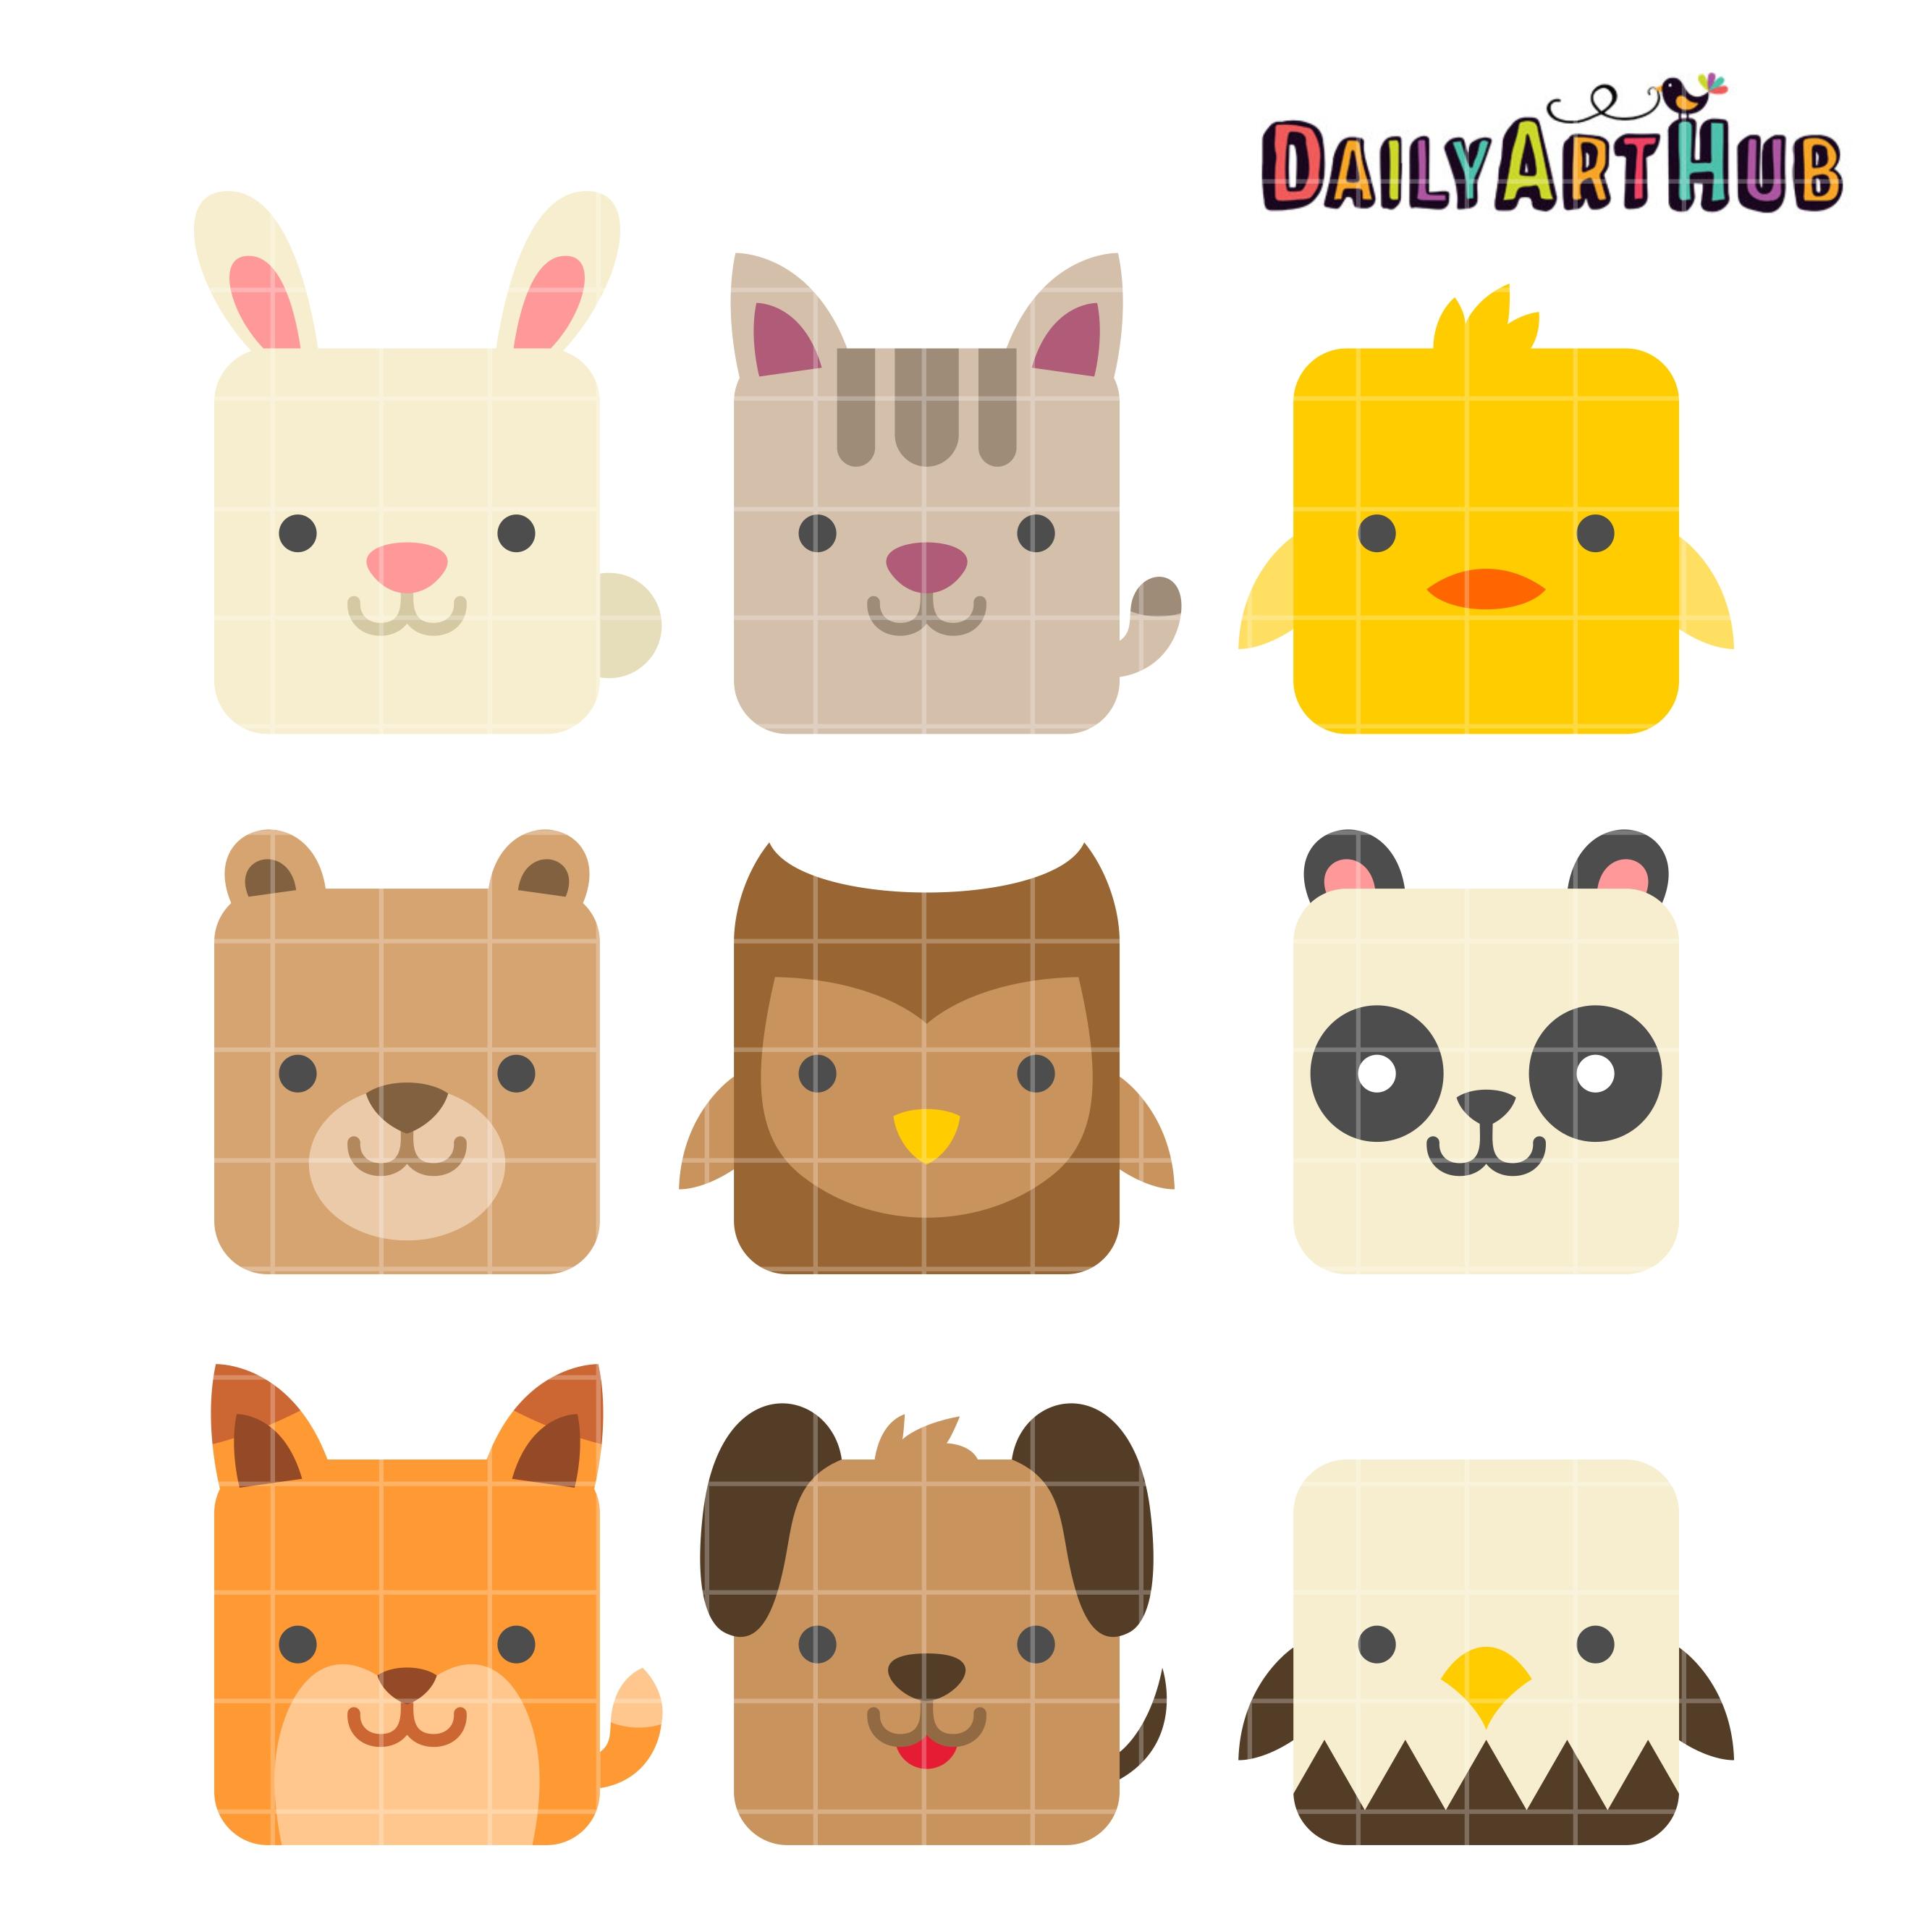 Square Cute Animals Clip Art Set | Daily Art Hub